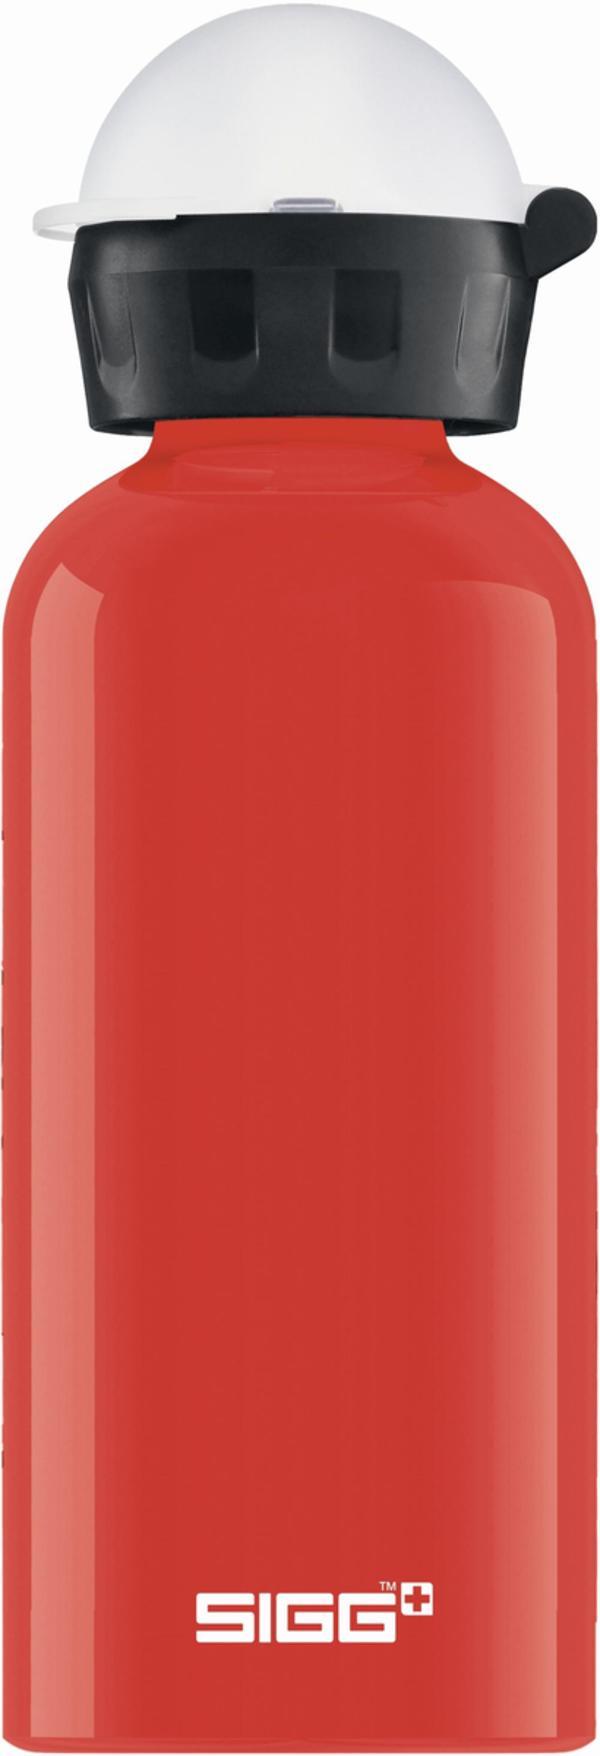 SIGG Kindertrinkflasche 400ml KTB Tomato